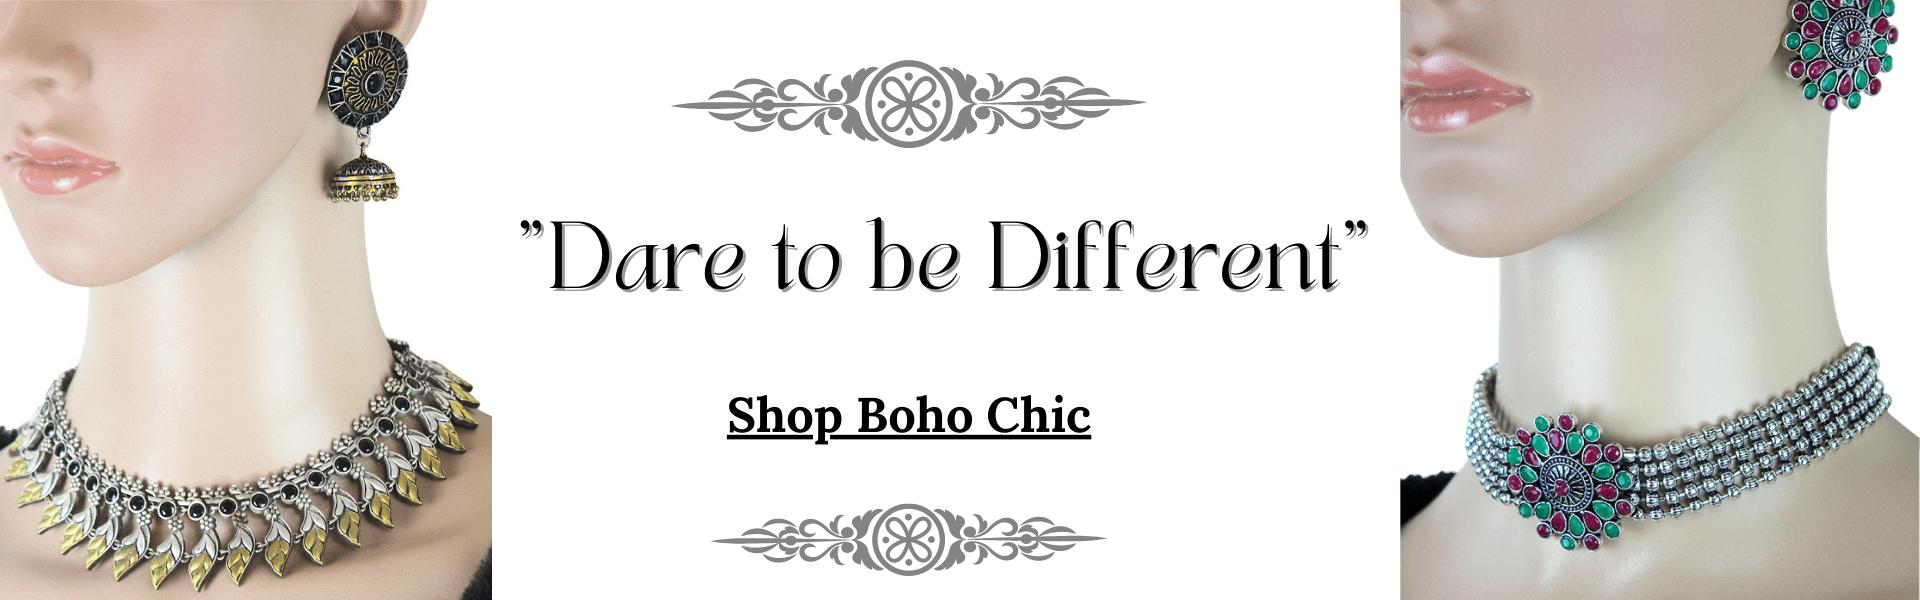 Boho Chic Banner